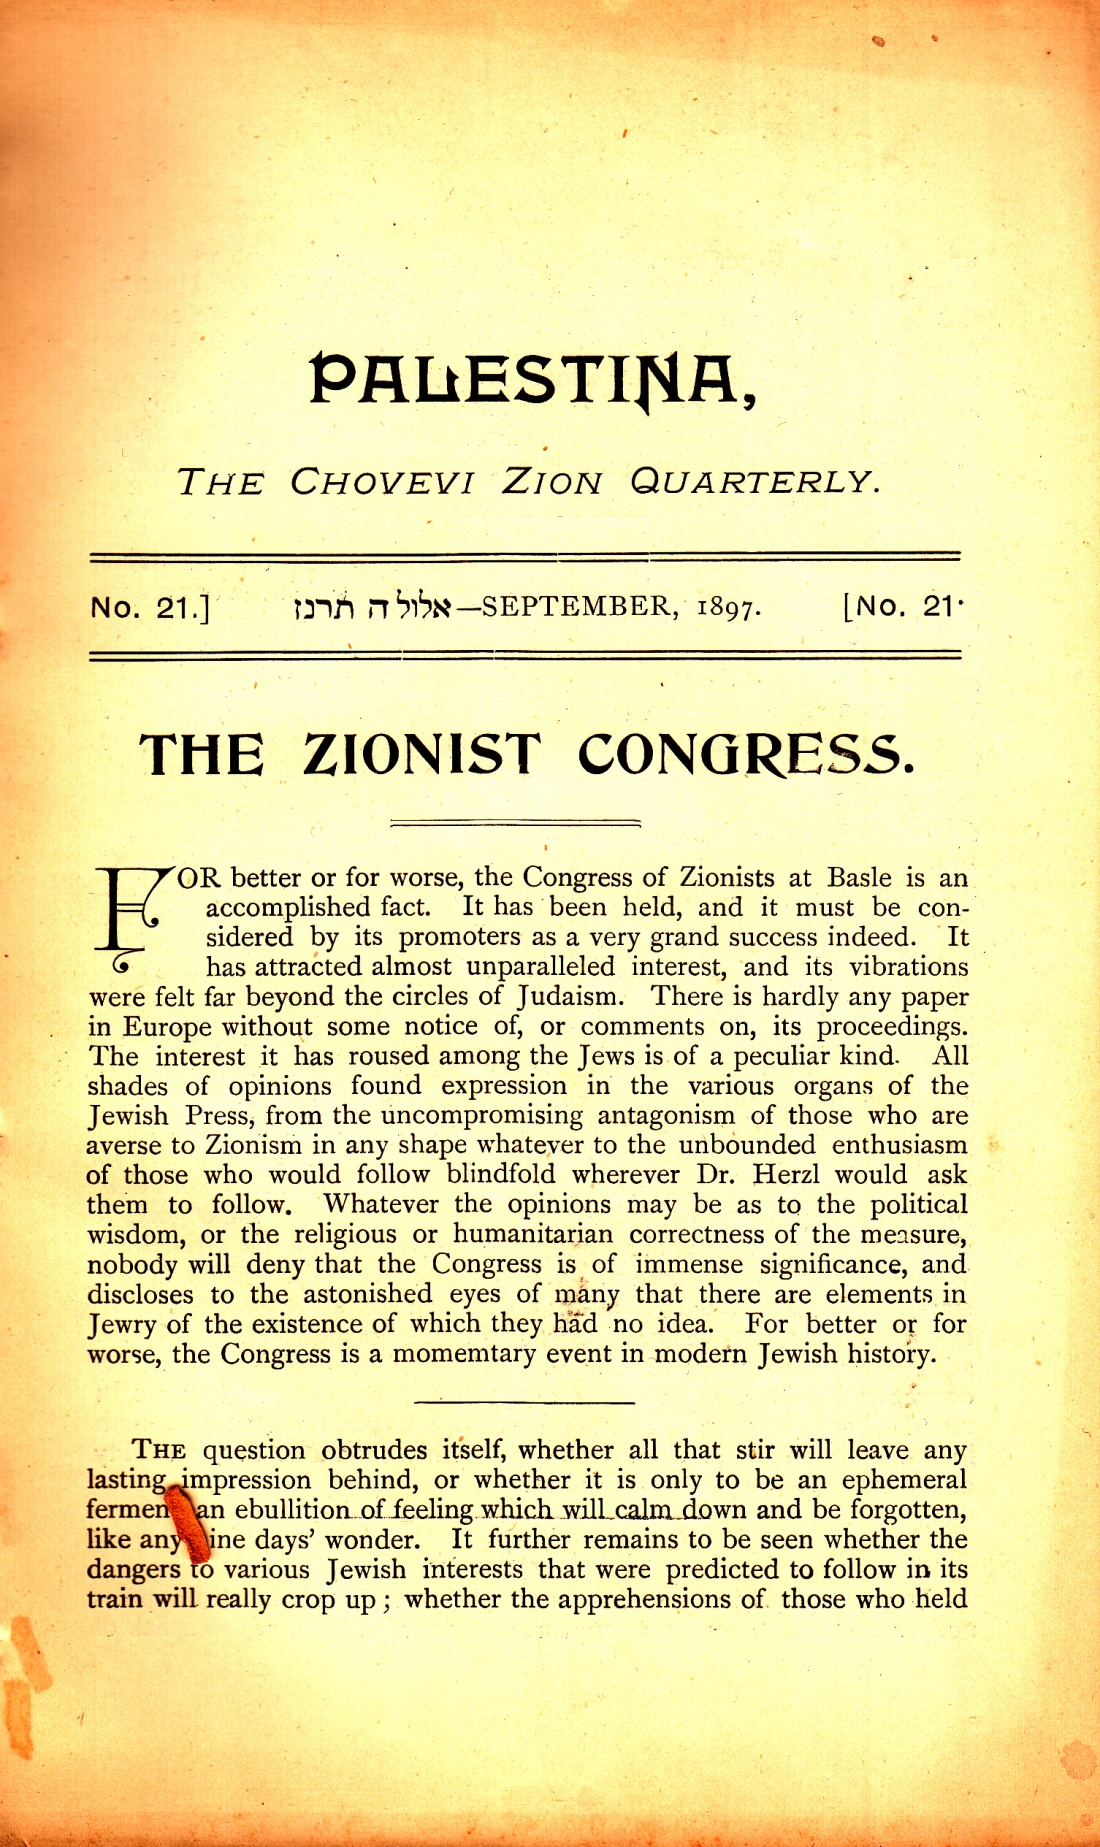 2 Palestina_0002